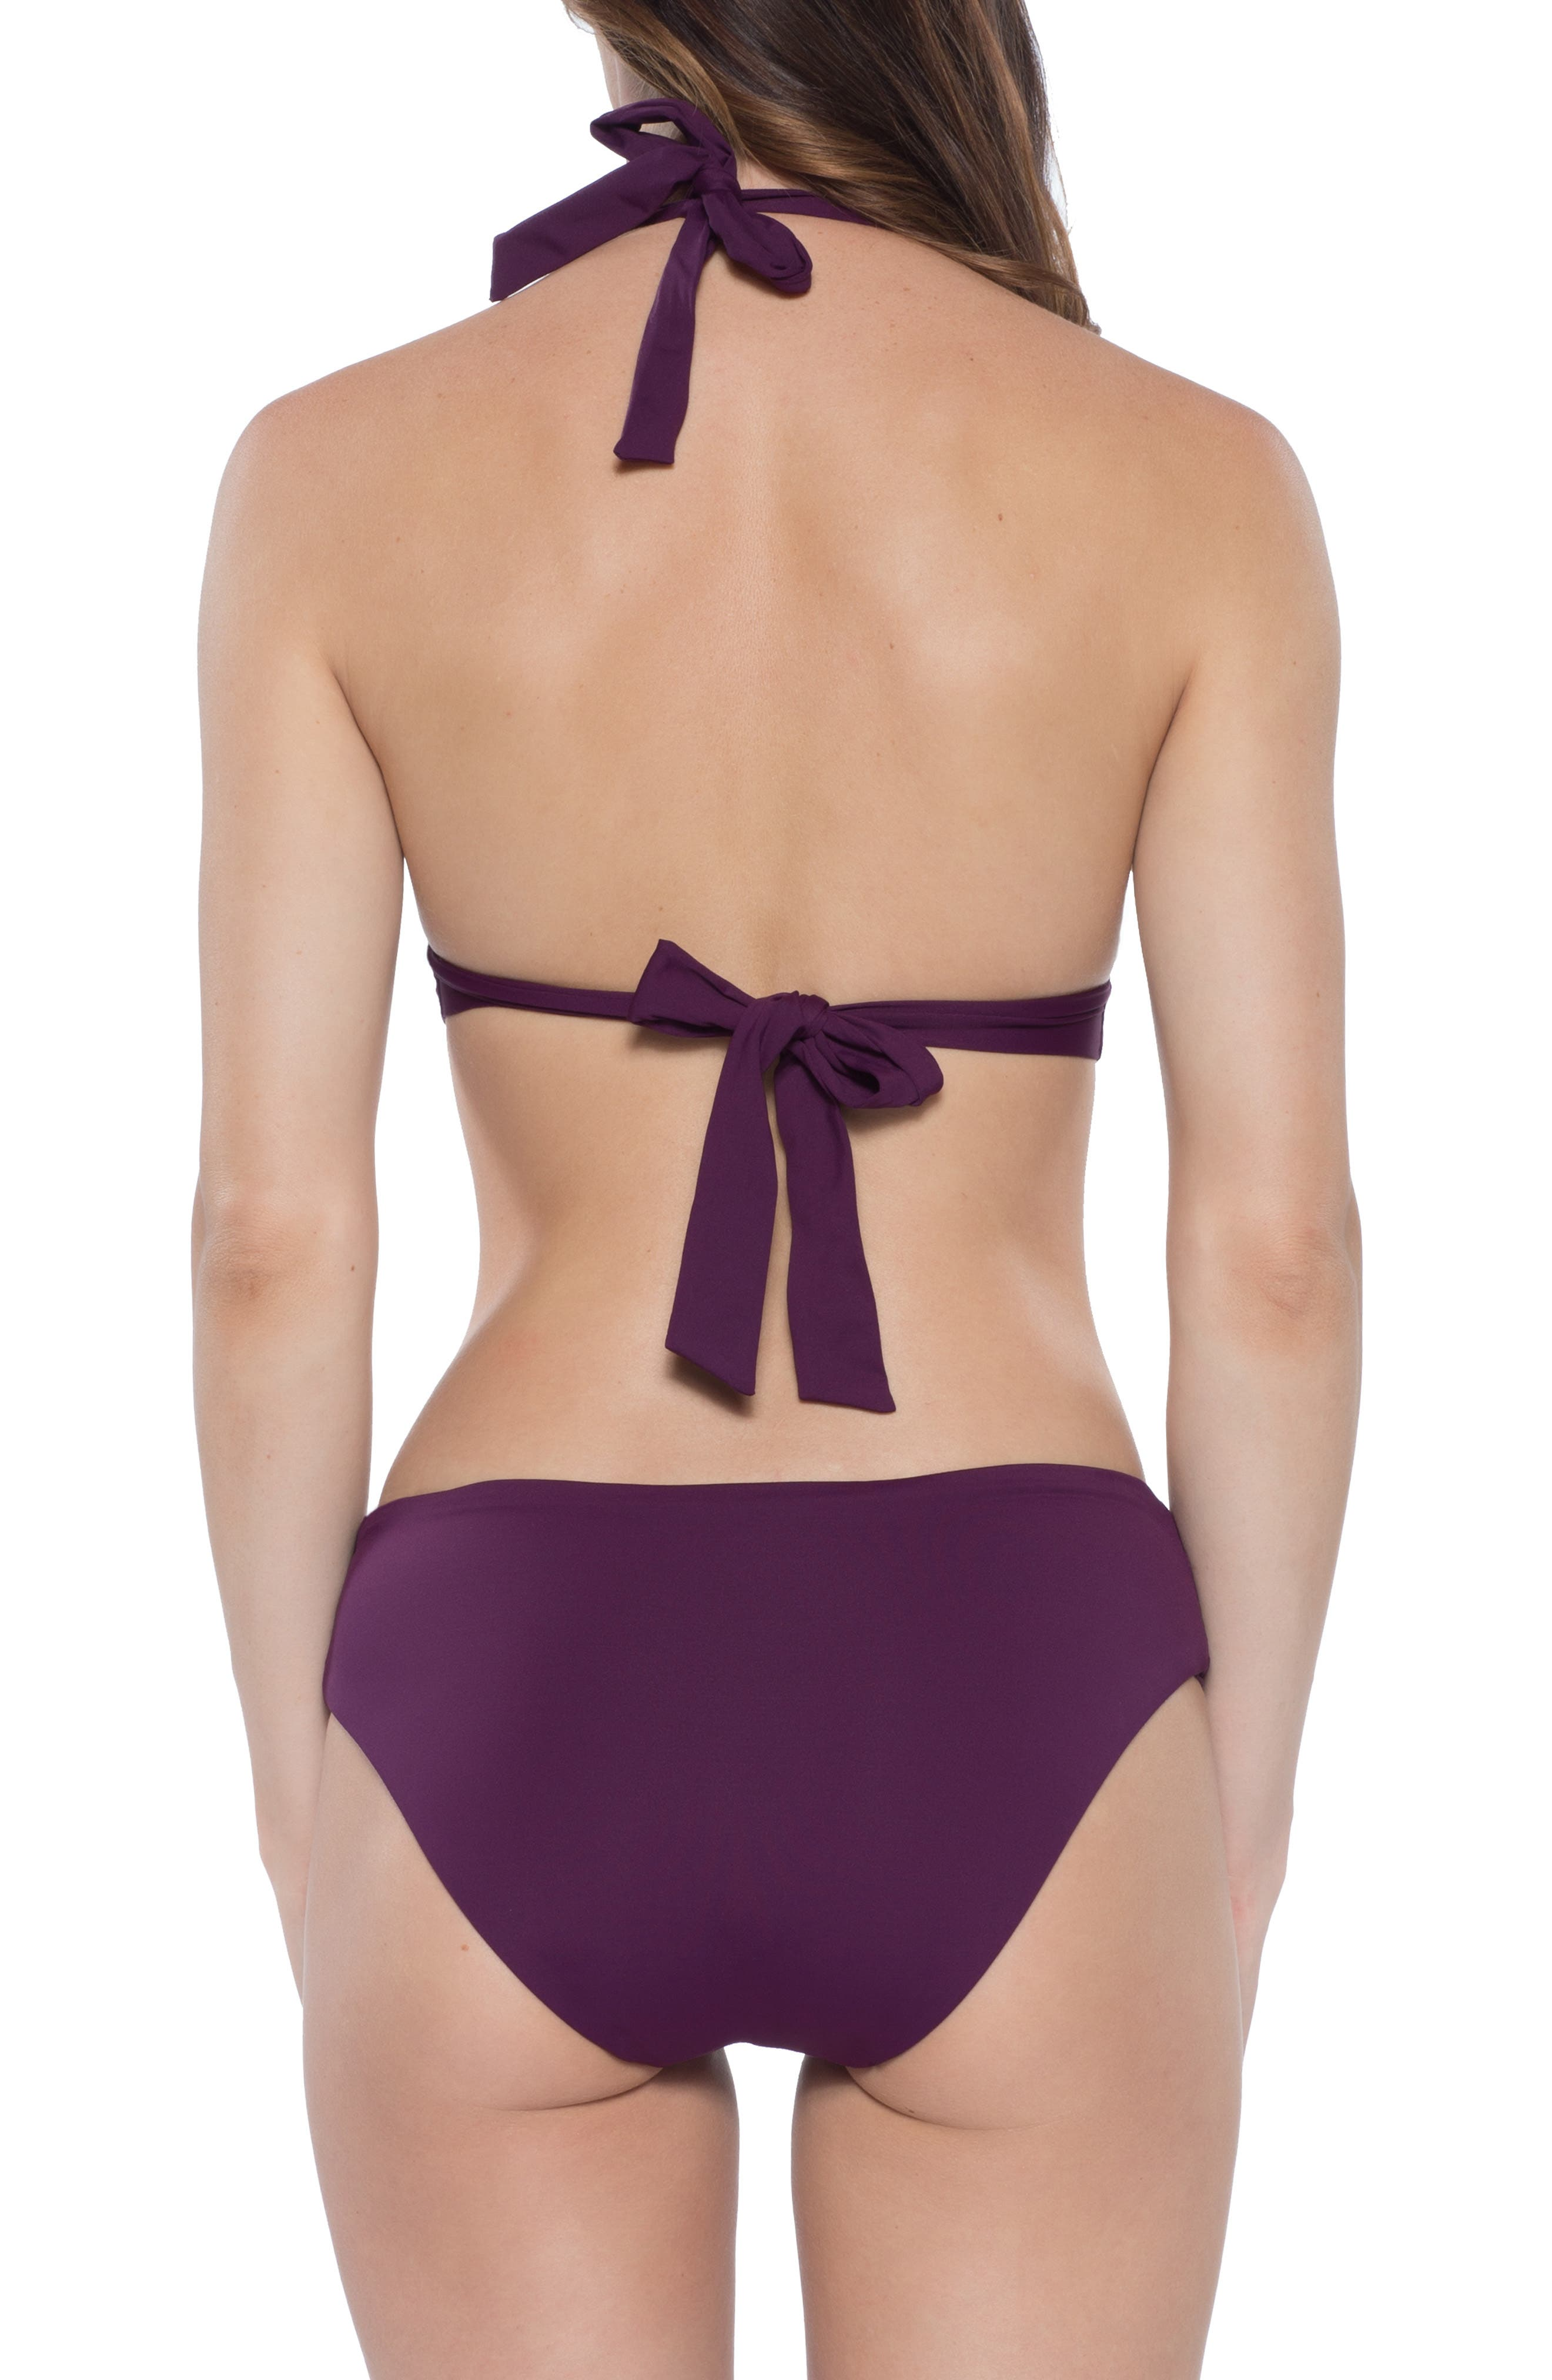 Reconnect Halter Bikini Top,                             Alternate thumbnail 8, color,                             MERLOT